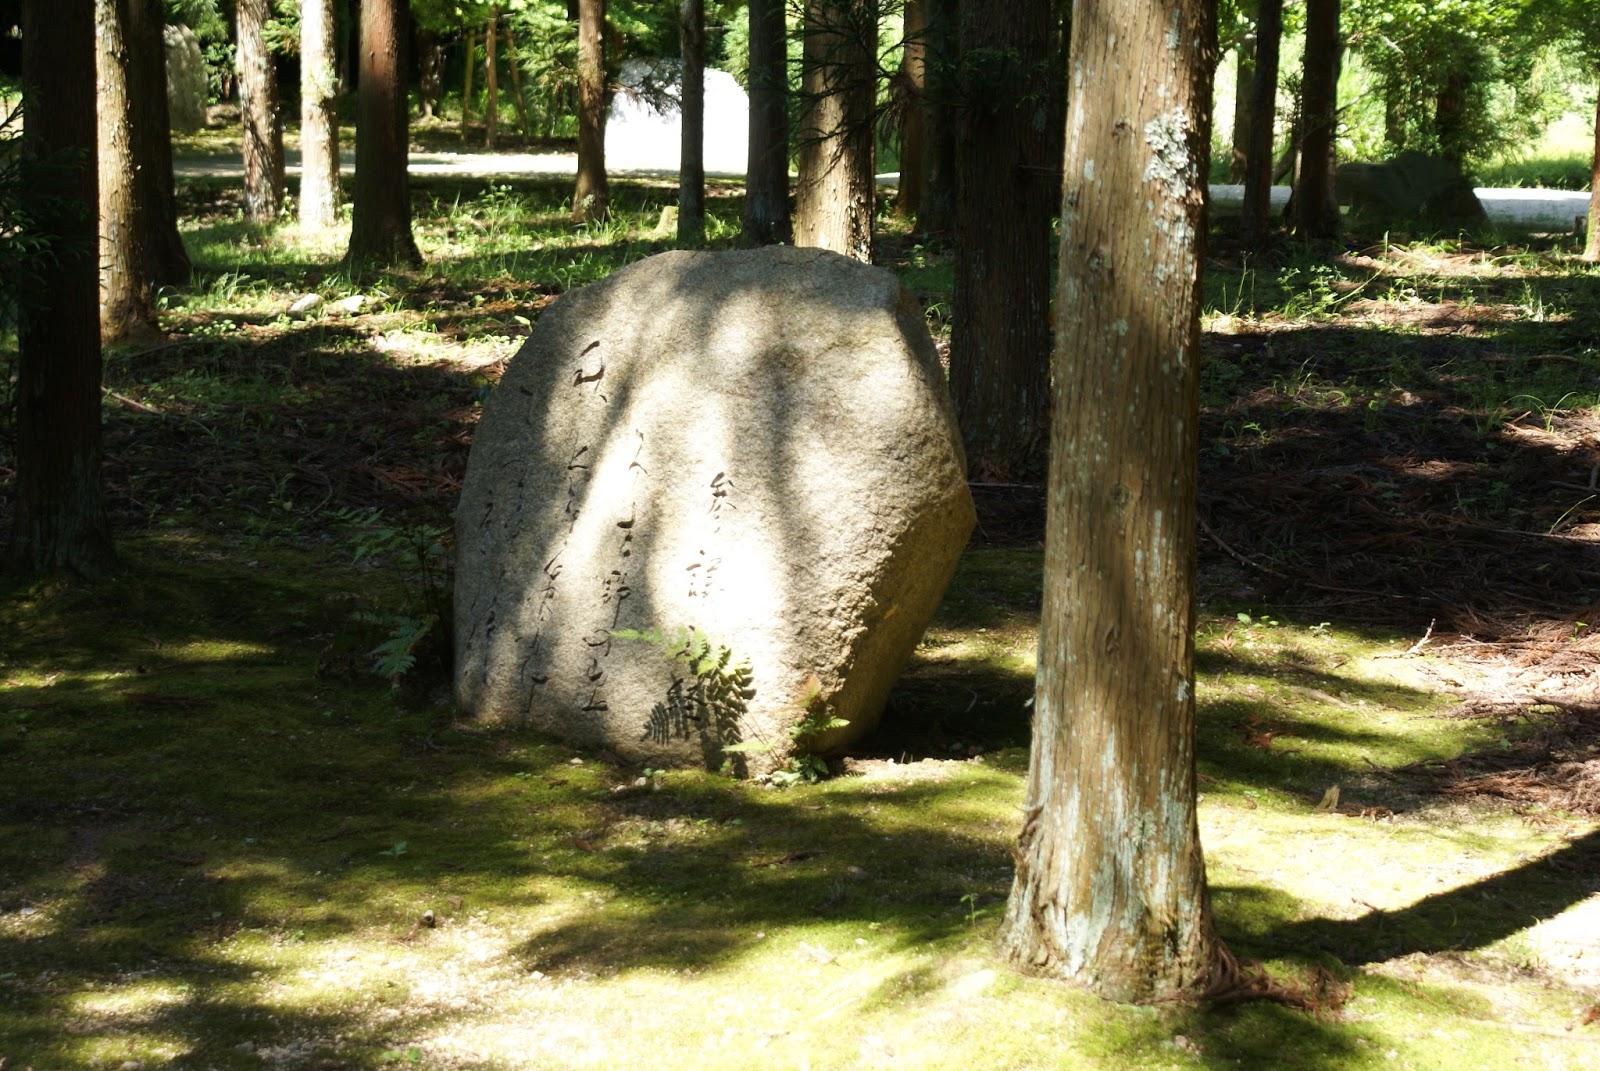 arashiyama kyoto japan zen stone